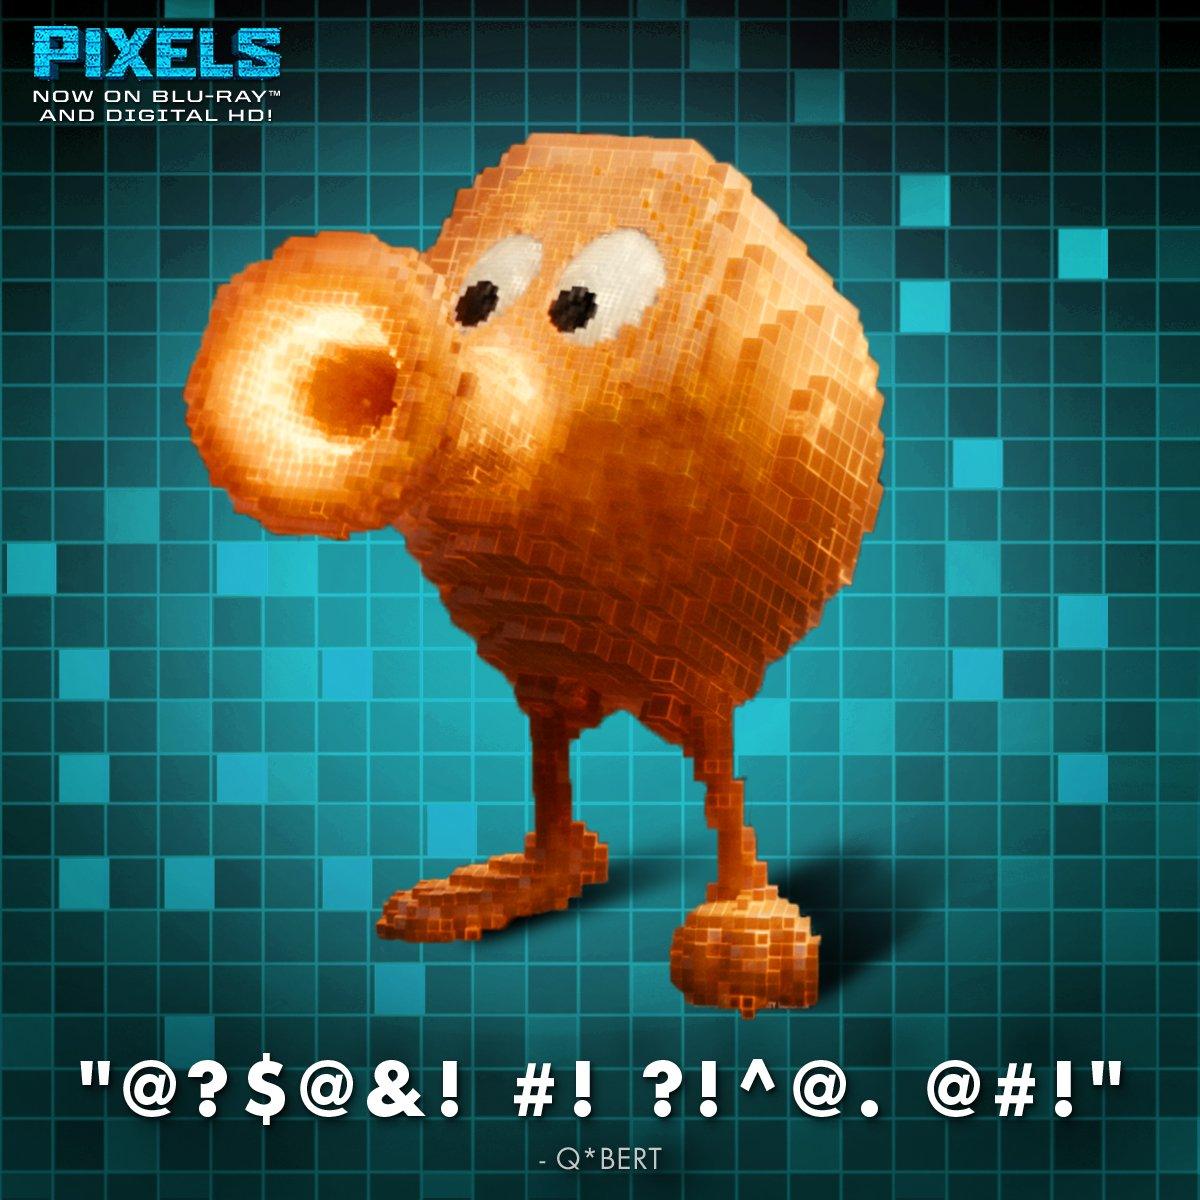 Pixels On Twitter Qbert Thought PixlesMovie Was A SYMBOLic Masterpiece Tco YC3Z9rRXH1 4yD84bgjmA